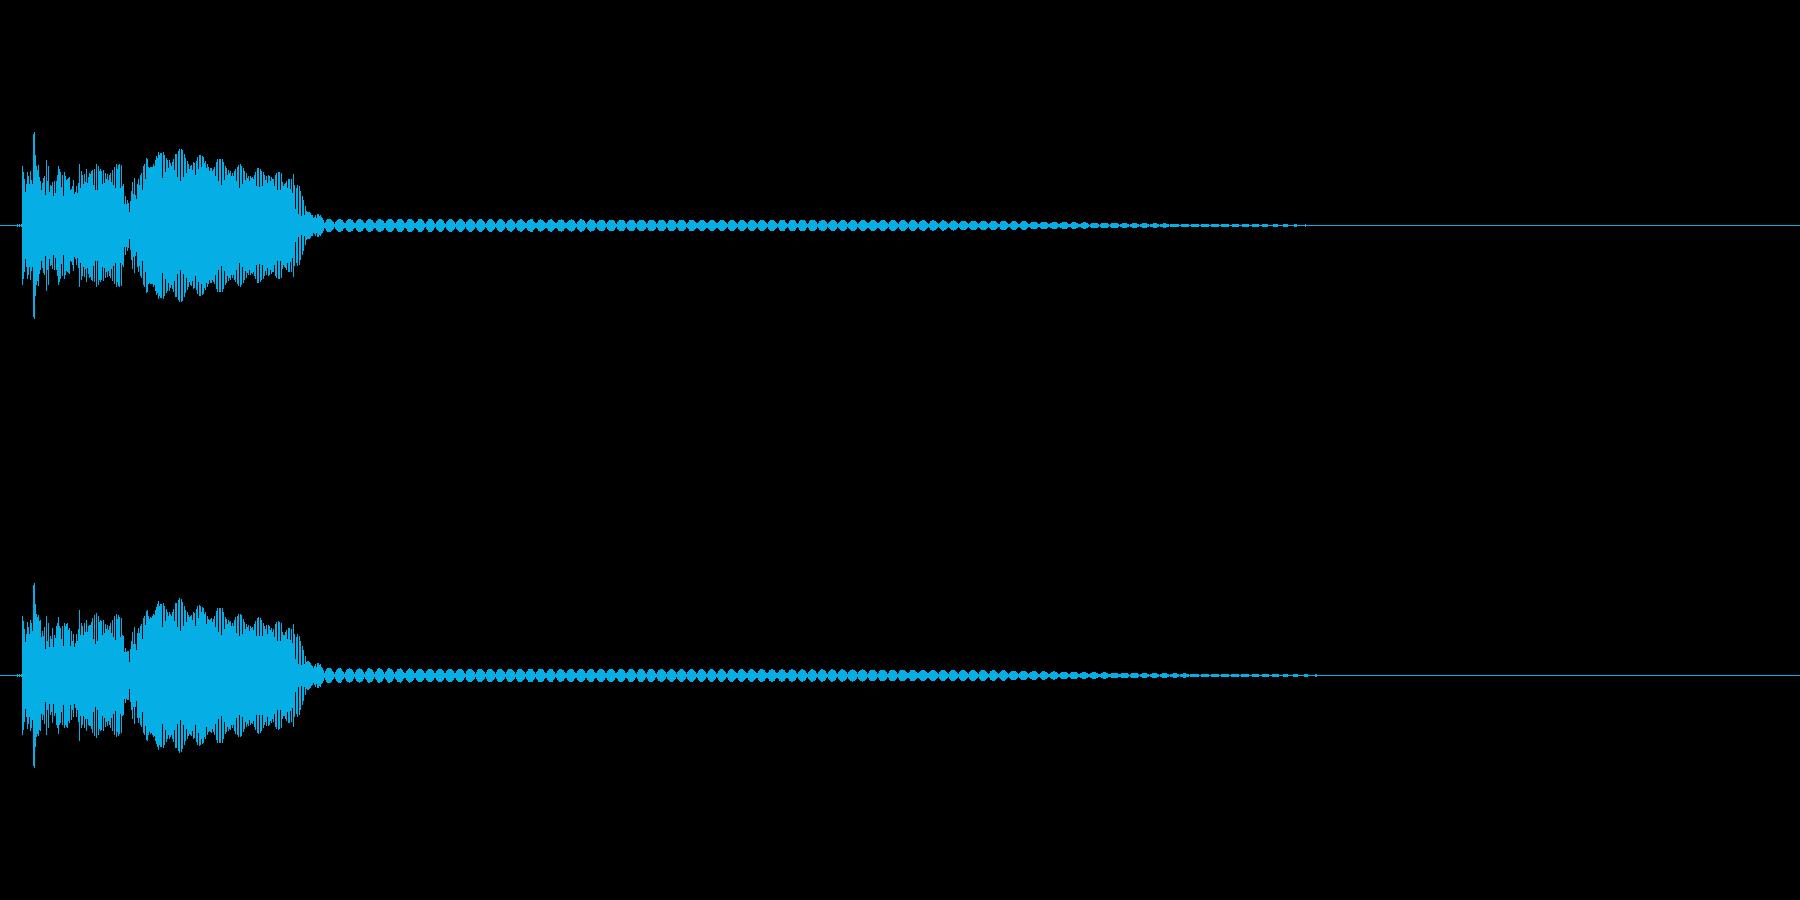 8bit効果音「ピロリーン」の再生済みの波形